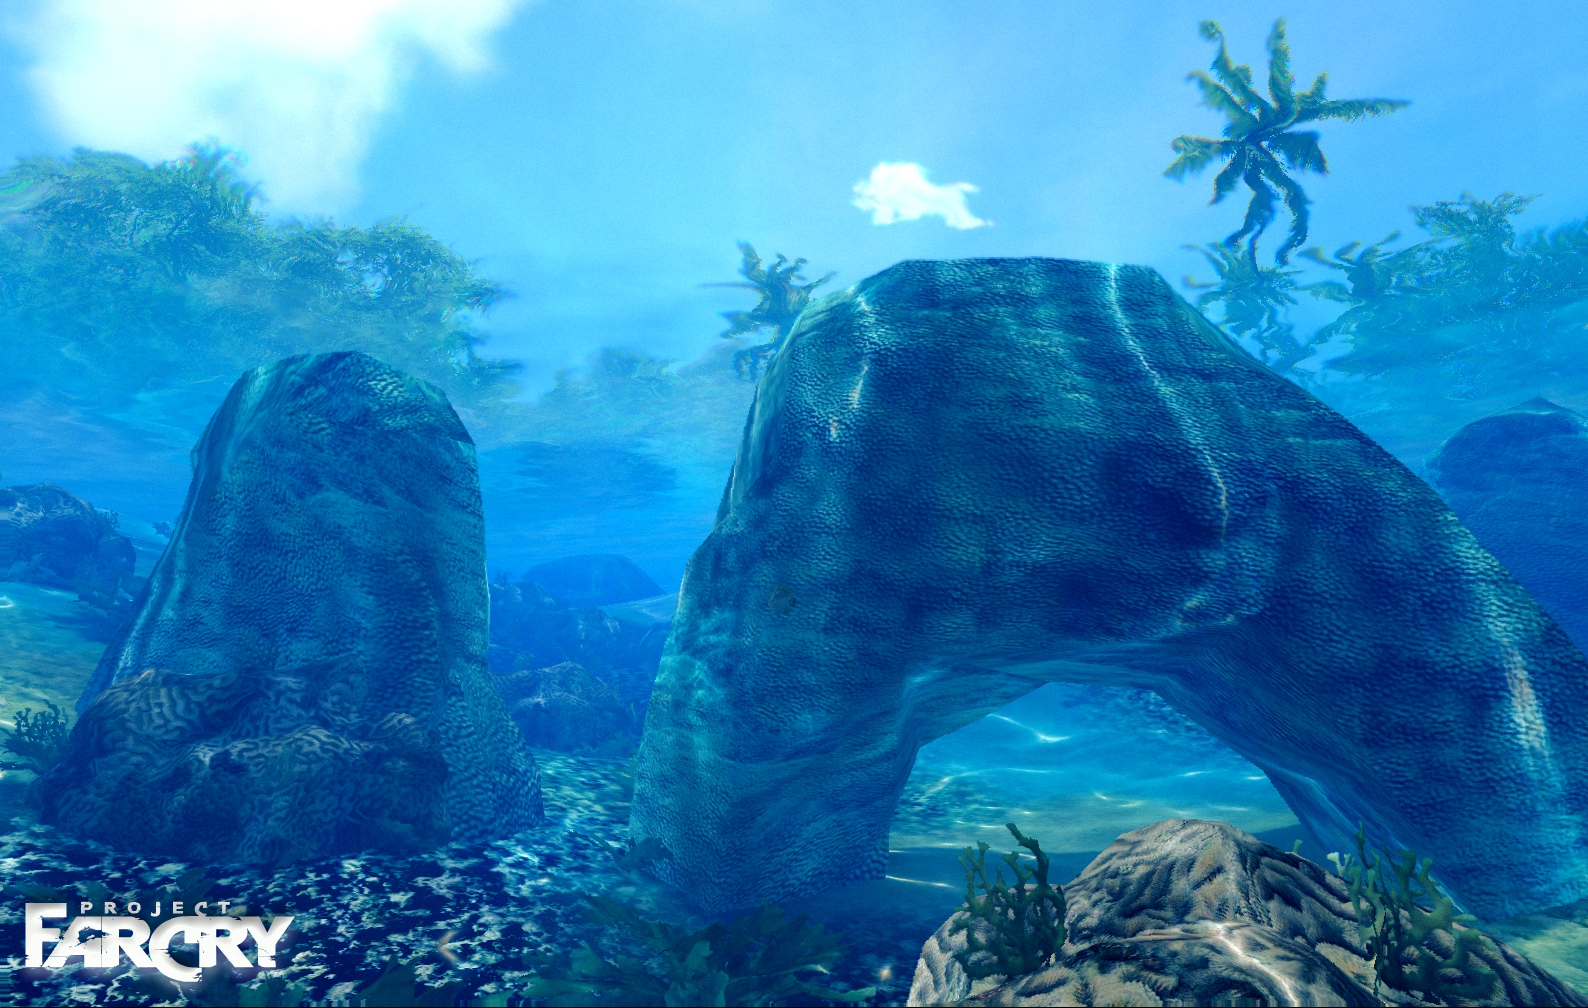 underwater ocean | underwater ocean view image - project far cry mod